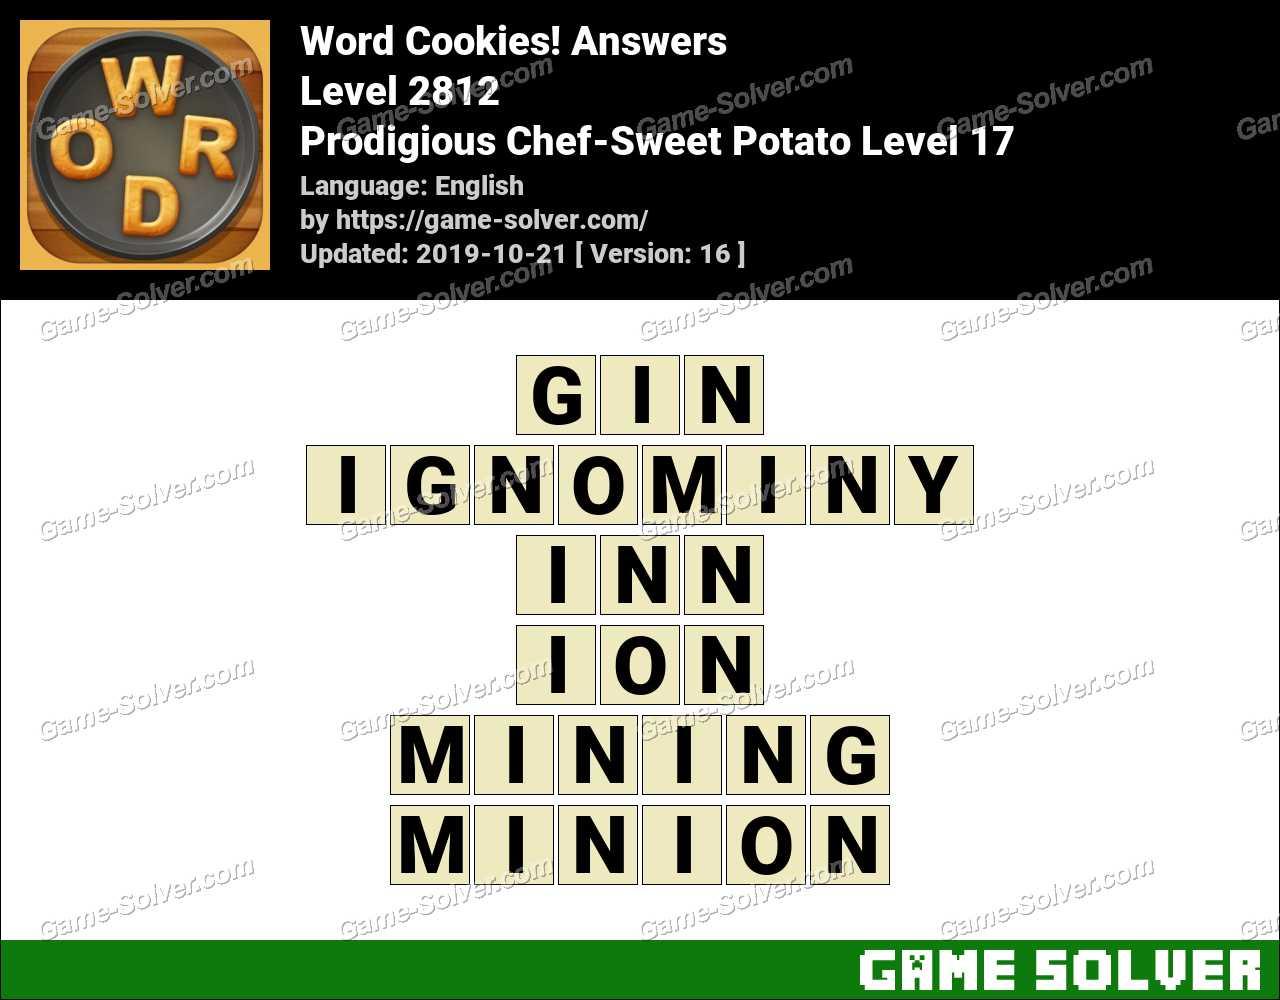 Word Cookies Prodigious Chef-Sweet Potato Level 17 Answers